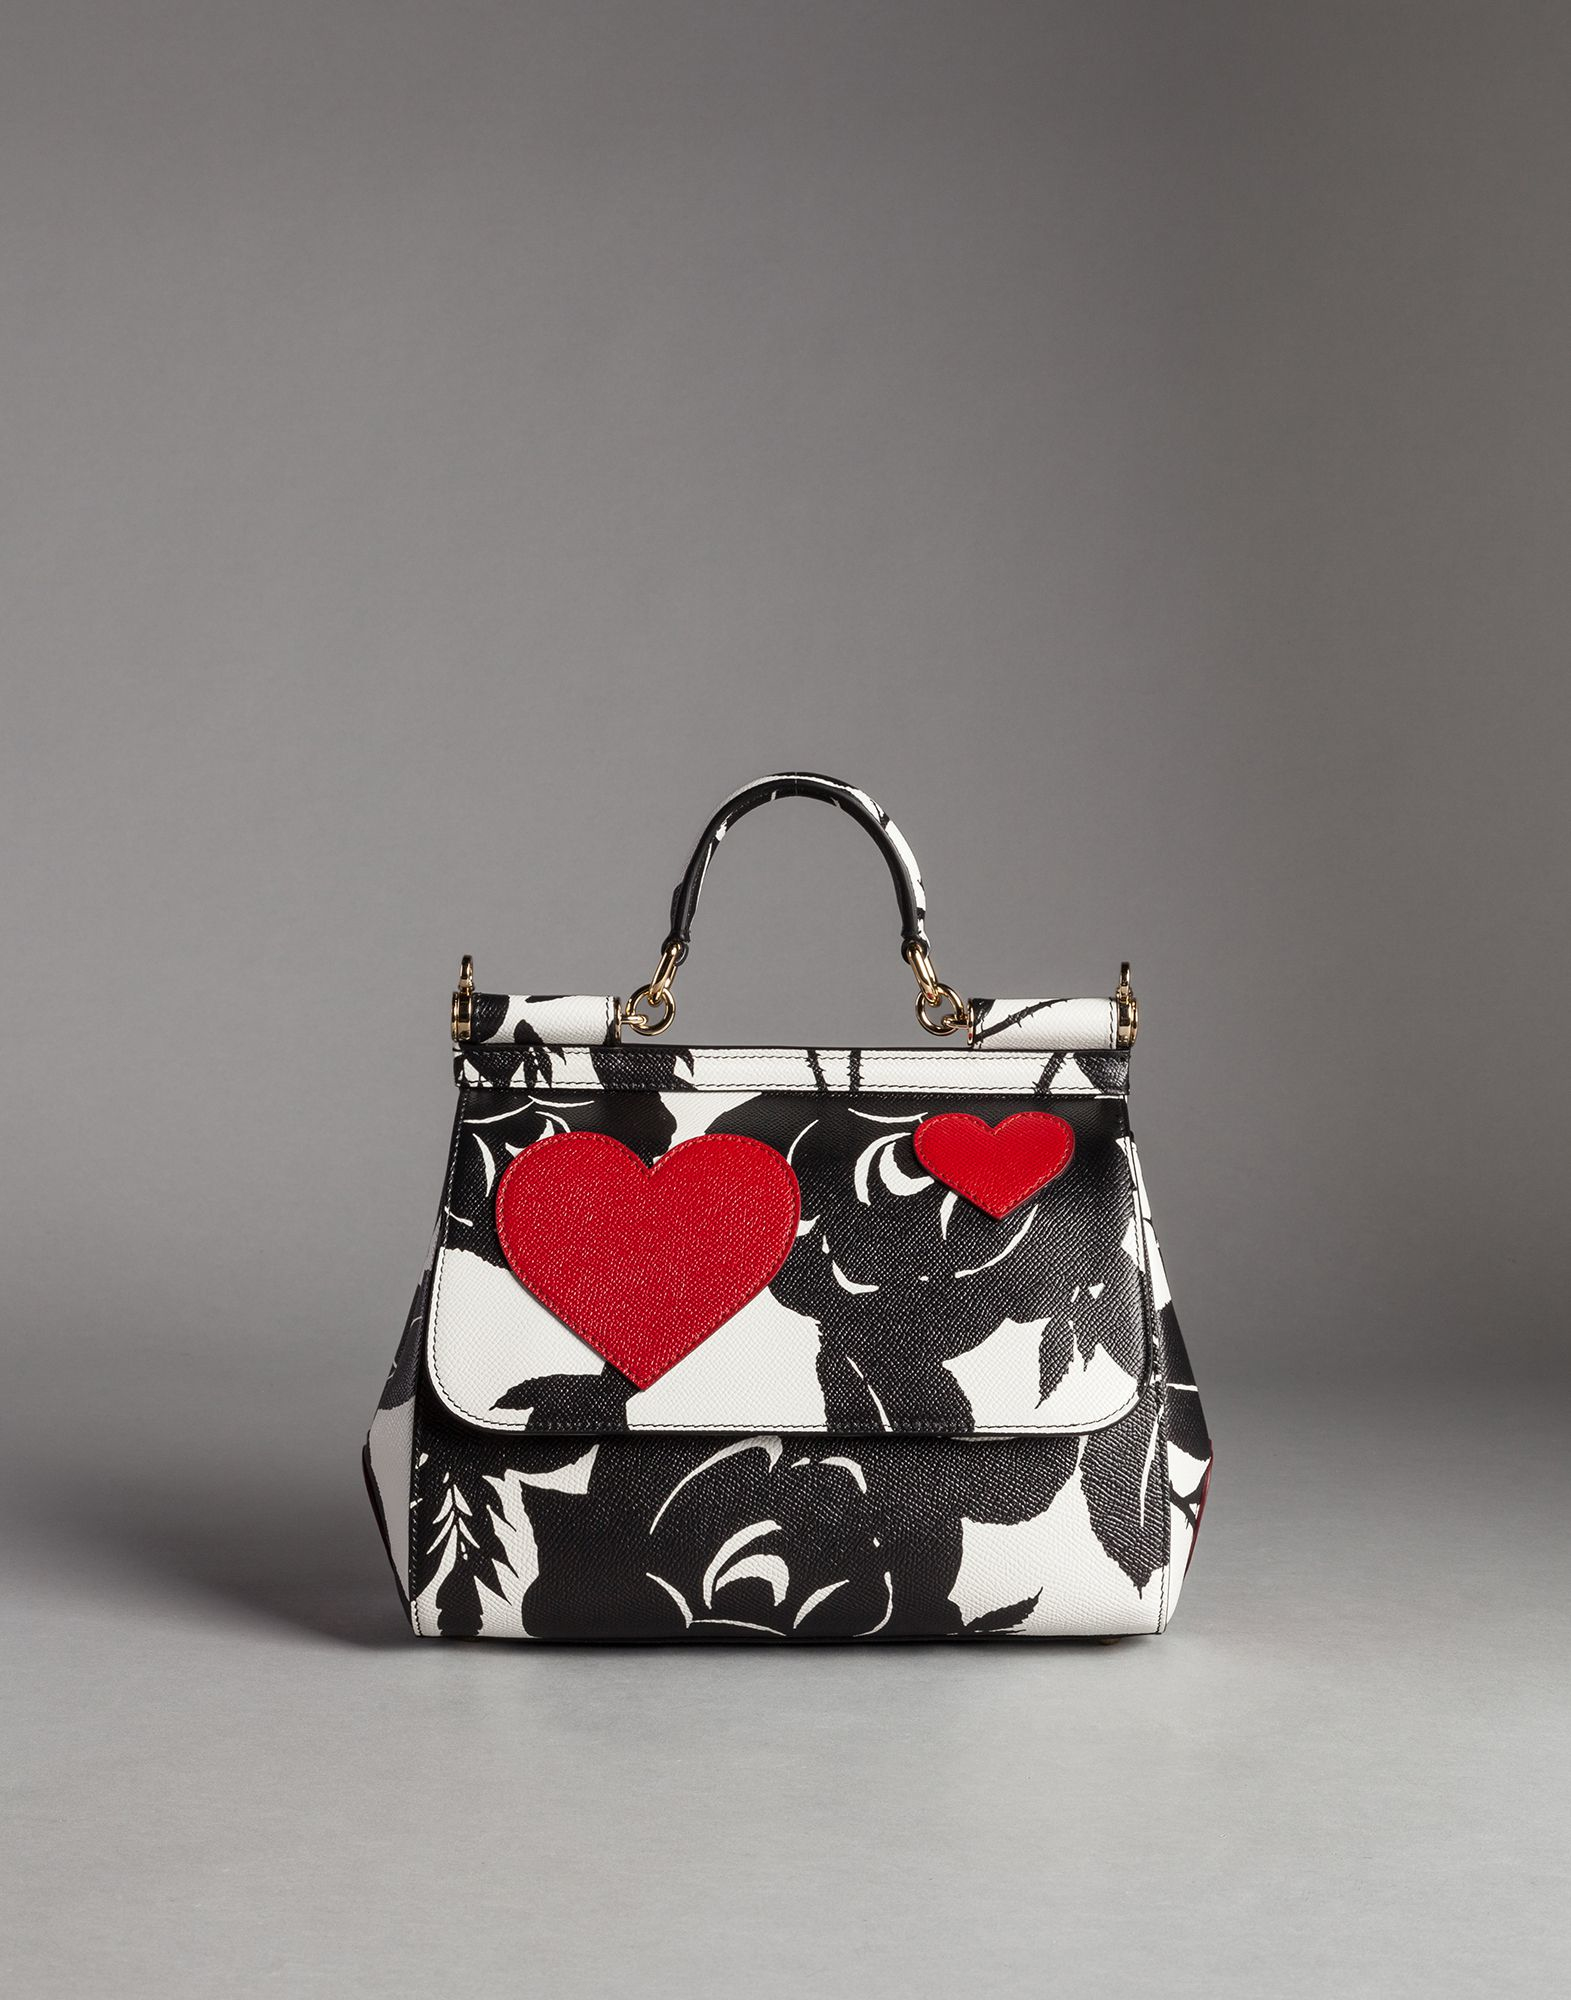 c8919bc02ddc Lyst - Dolce   Gabbana Heart And Flower Print Medium Calfskin Sicily Bag in  Black